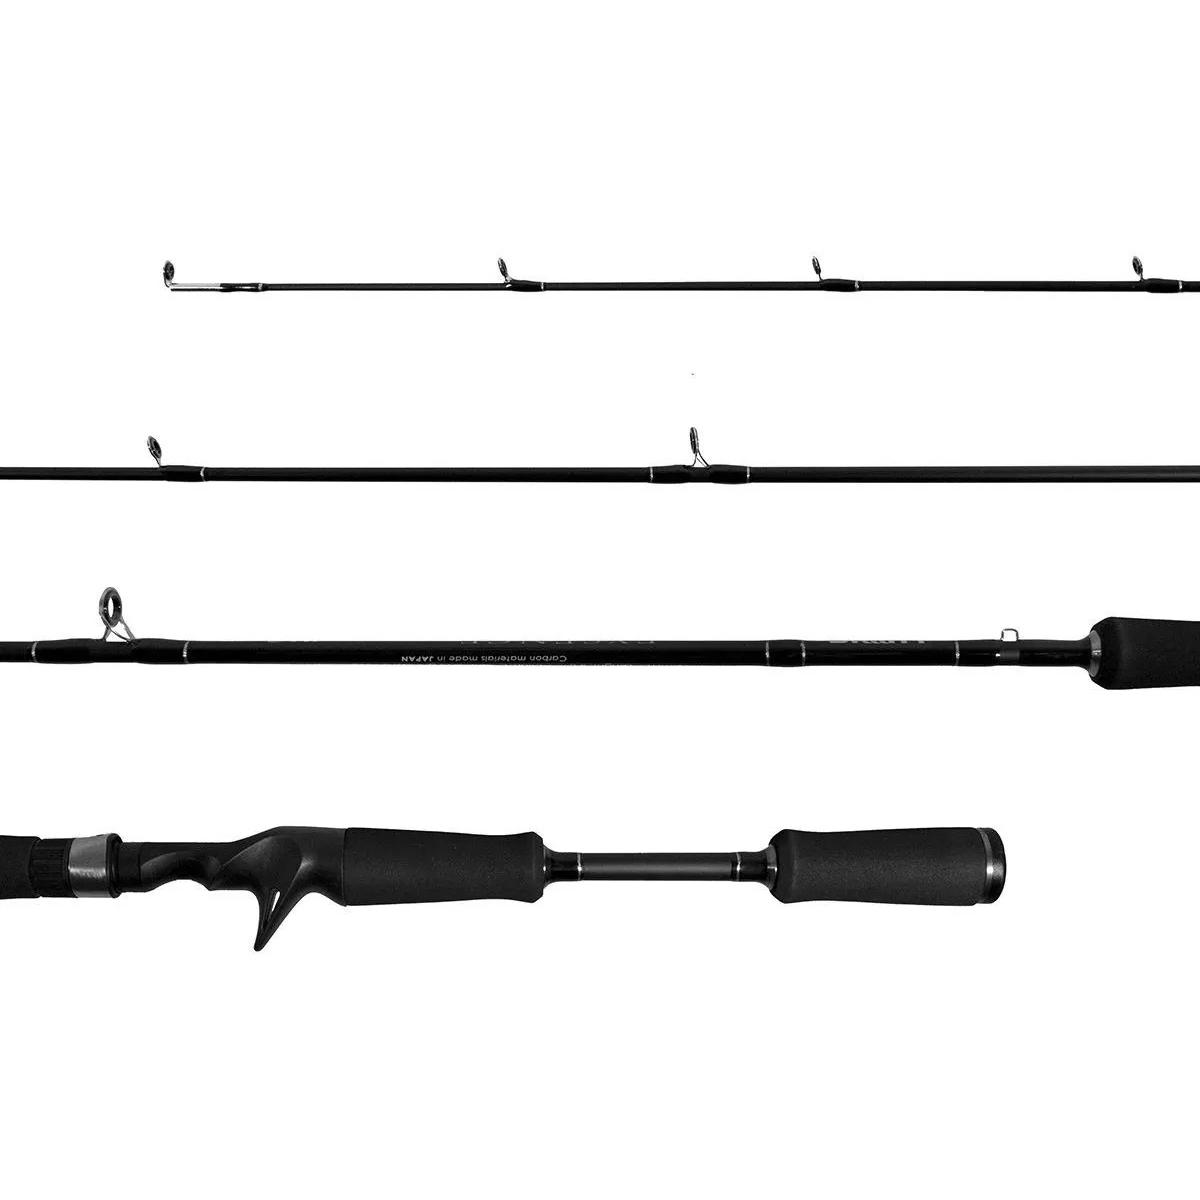 Vara Lumis Exsence 561 (1,68m) 8-20lb P/ Carretilha Inteiriça  - Pesca Adventure